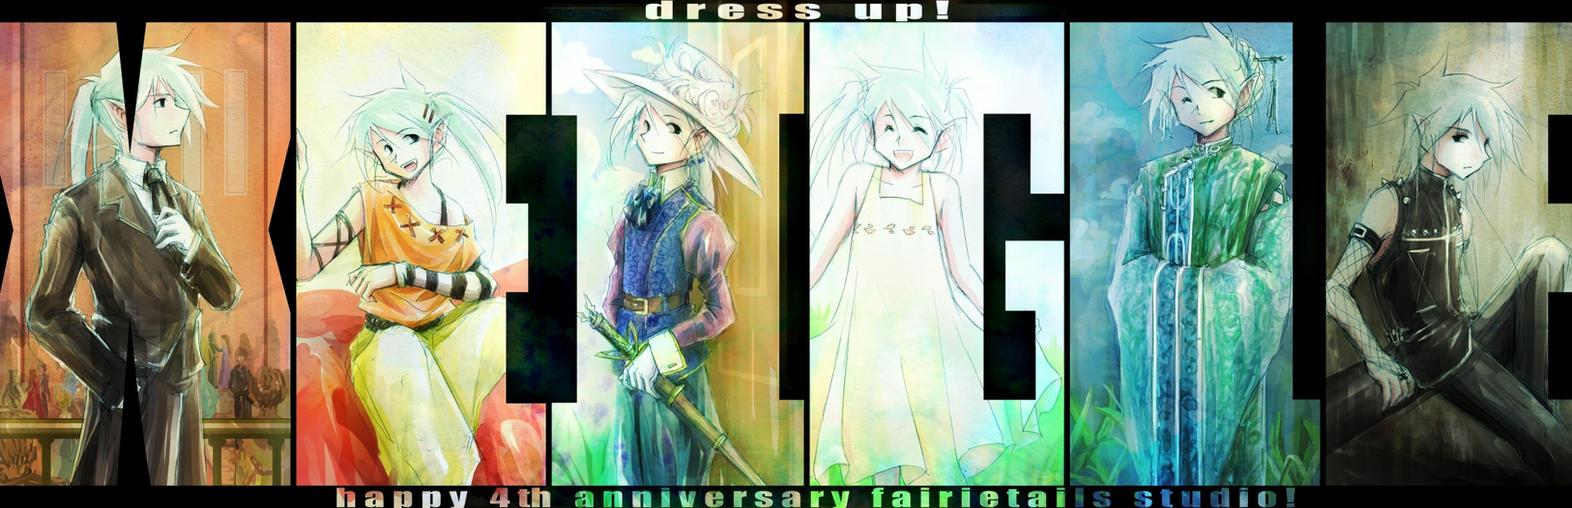 dress up--XEIGLE by Achiru-et-al